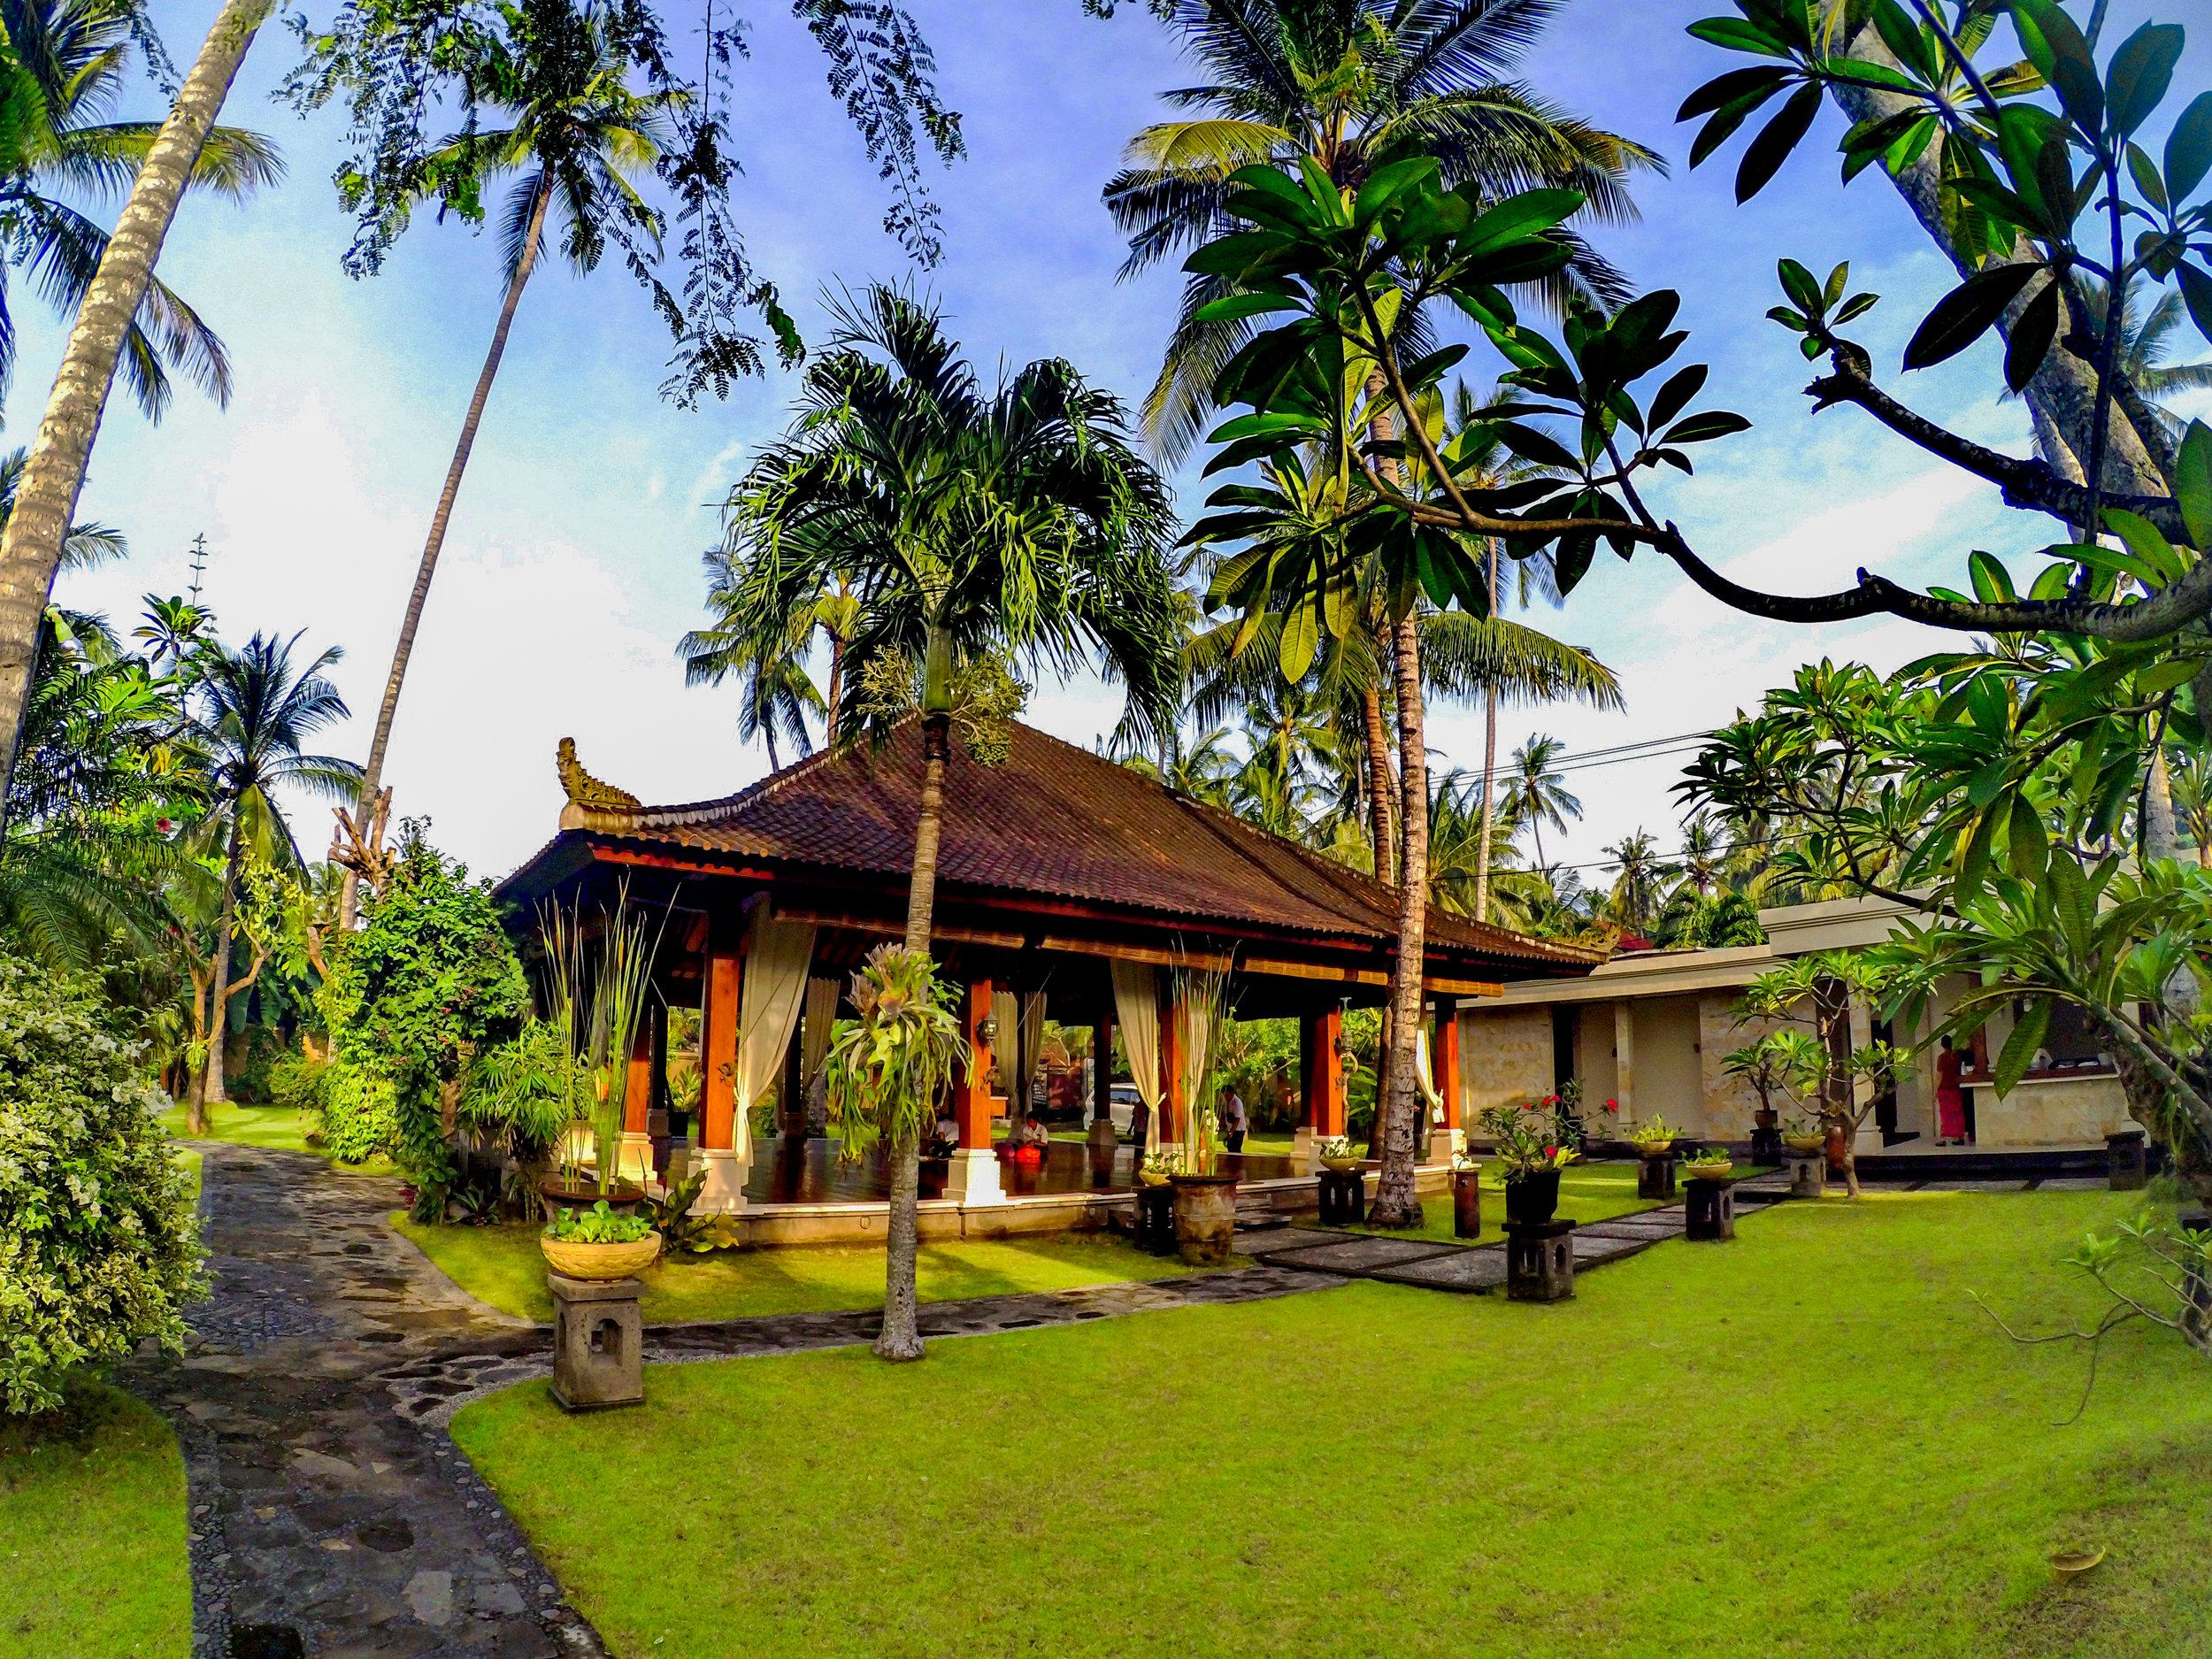 Bali YP Practice Shala